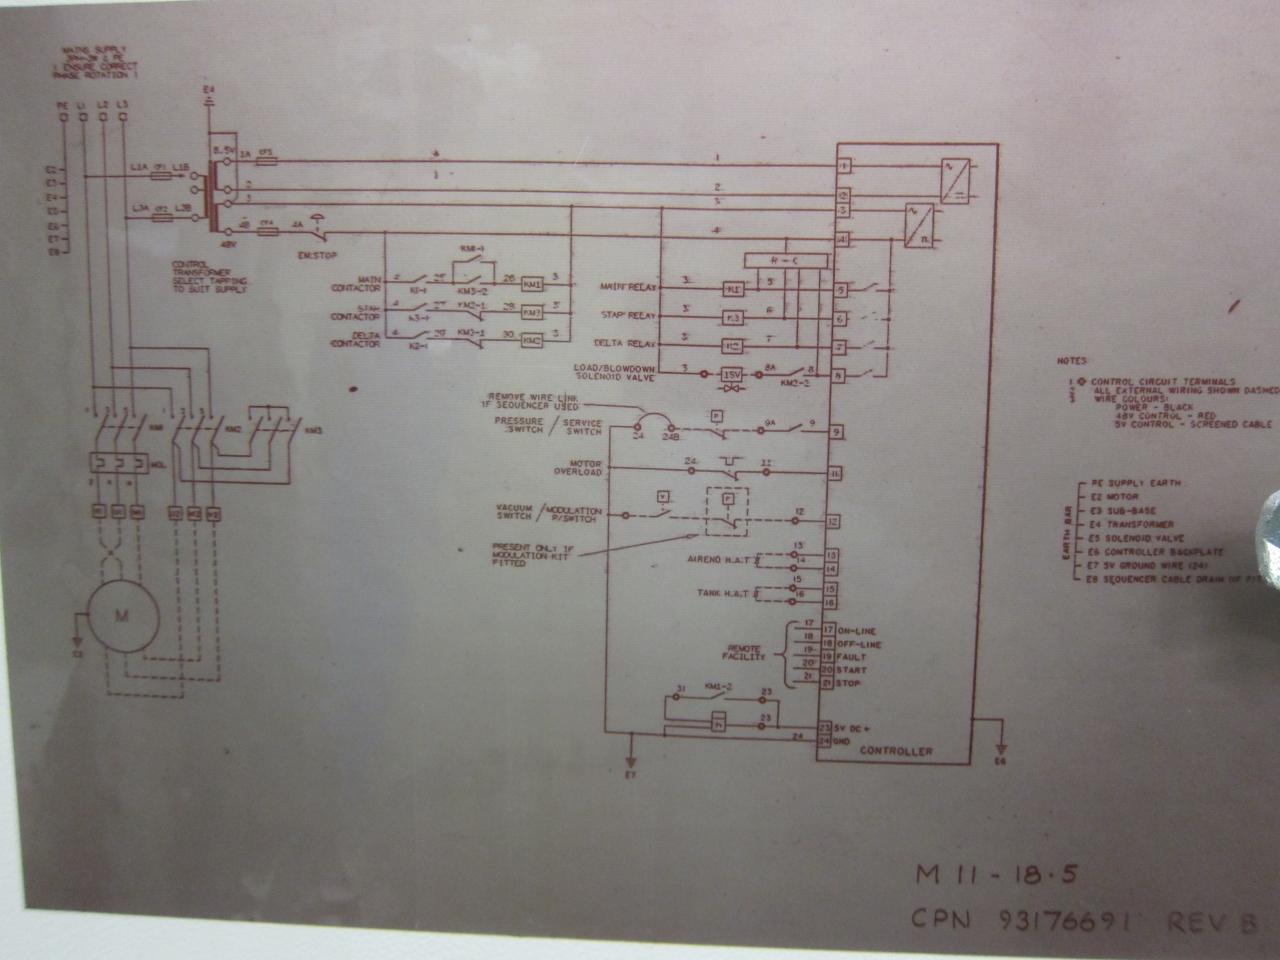 Hos Bv Gebruikte Koeltechniek Used Refrigeration Equipment Ingersoll Rand P185 Wiring Diagram